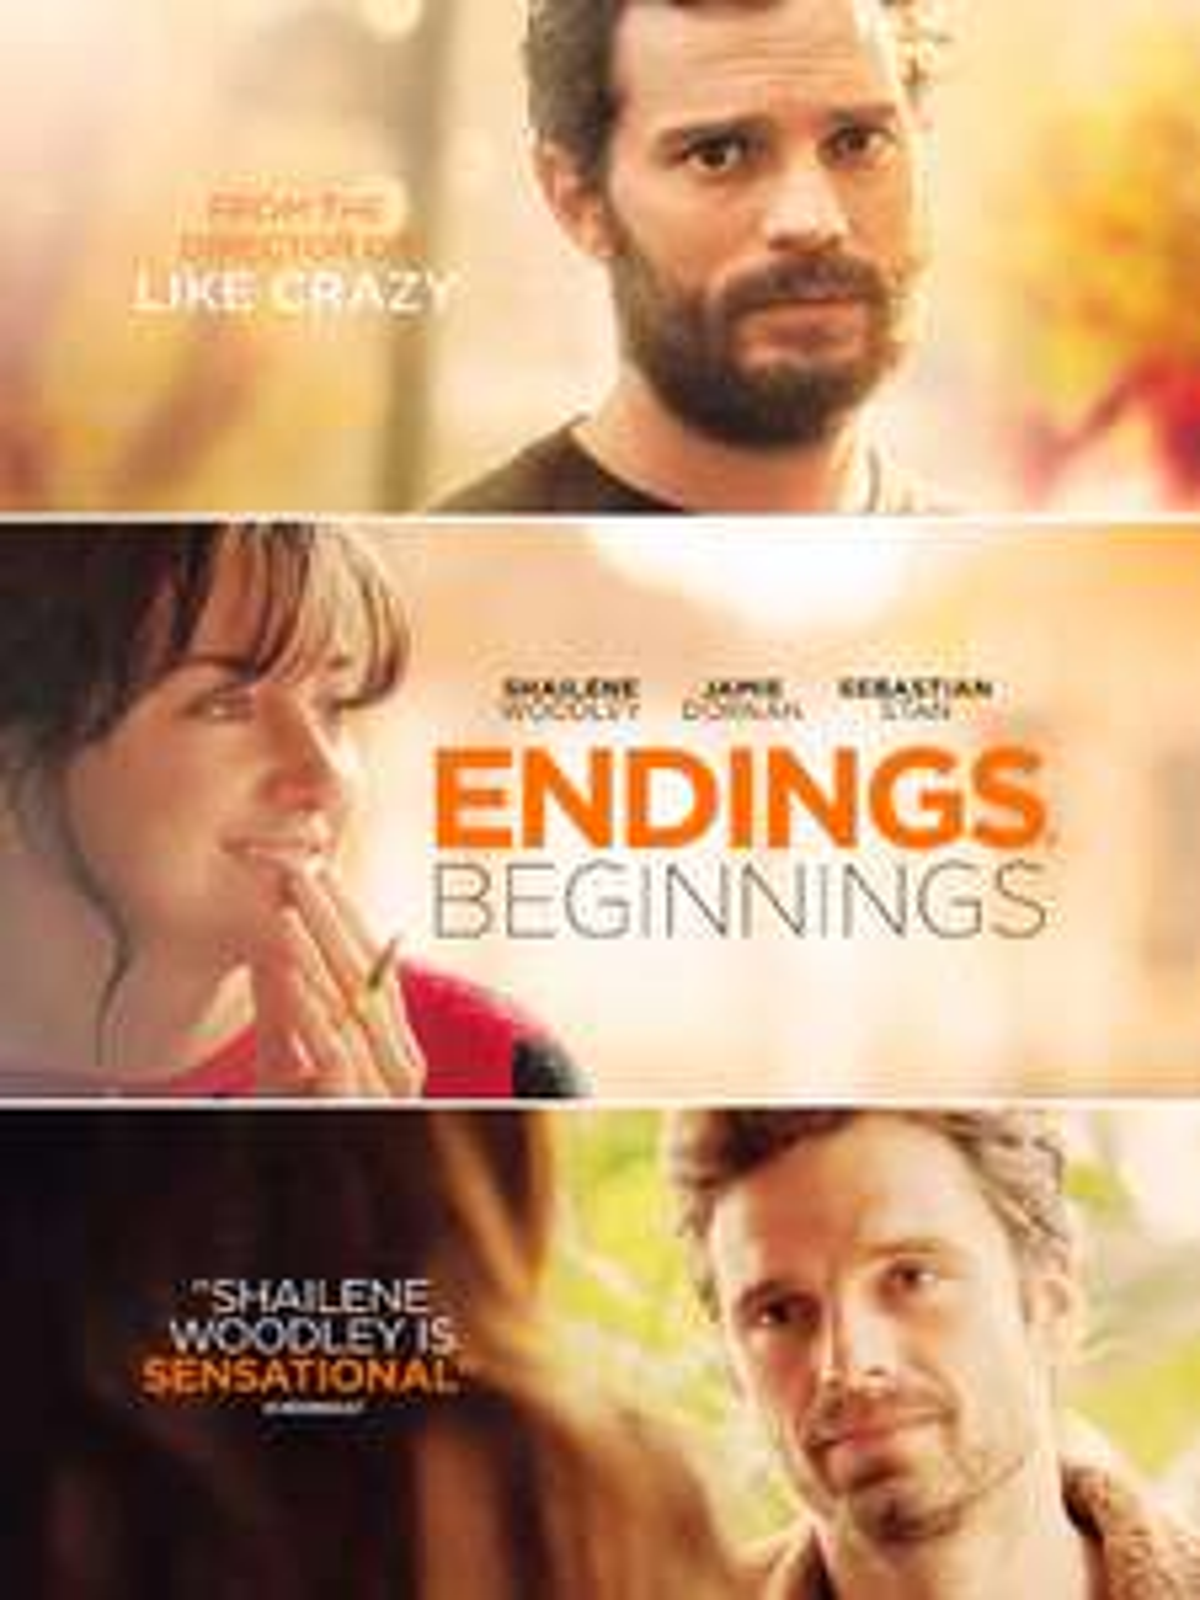 Endings, Beginnings (2020) HD to own 99p @ Amazon Prime Video